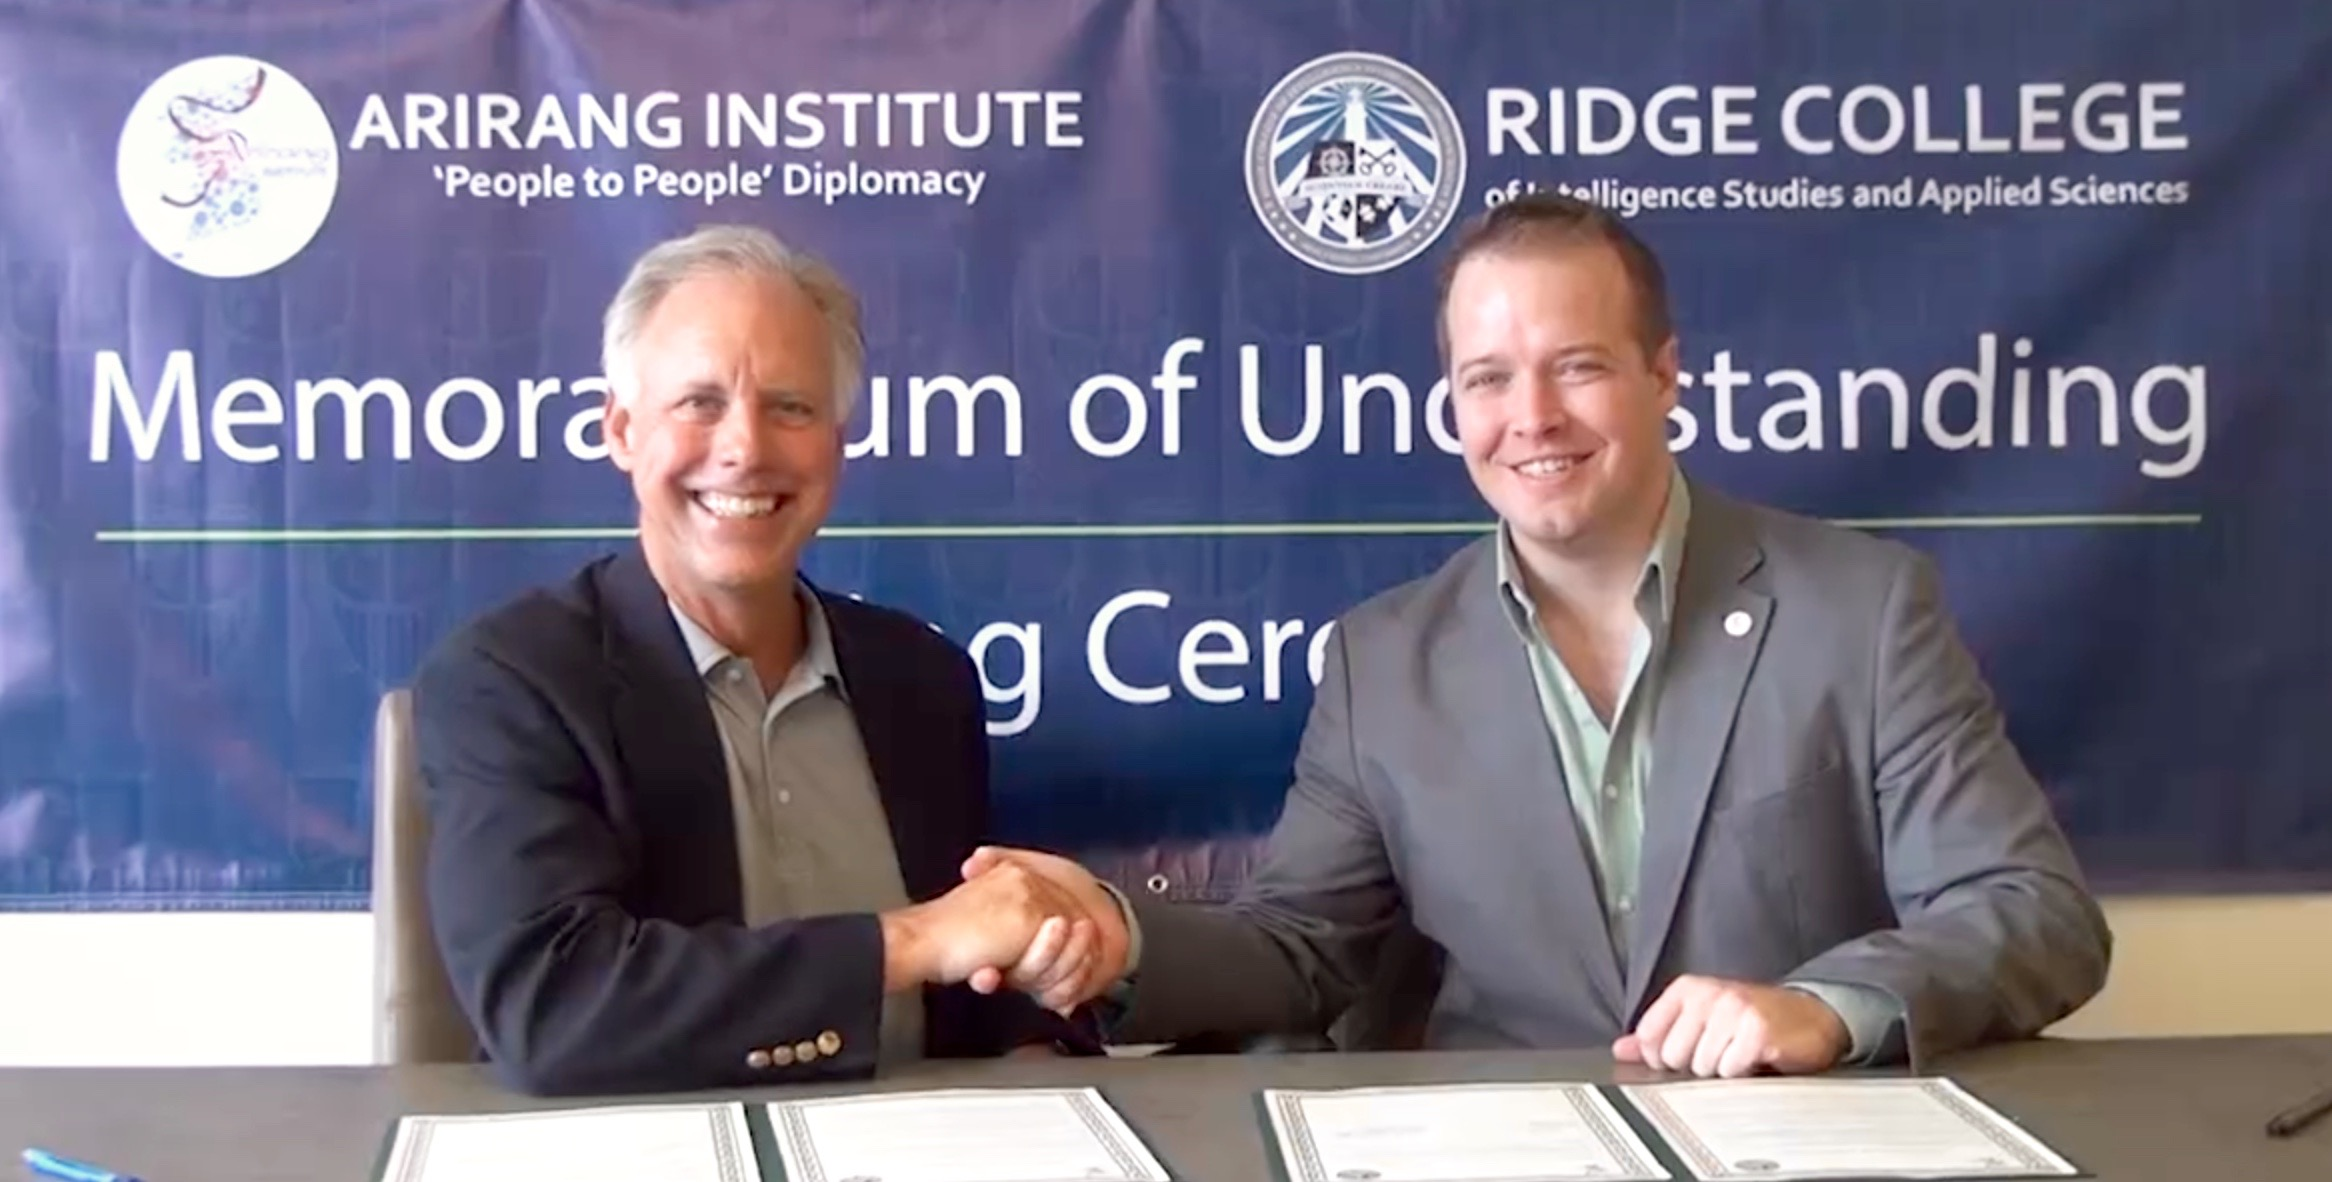 From Left to Right: Dr. James Breckenridge, Dean of The Ridge College at Mercyhurst Univeristy; Mr.Michael Lammbrau, U.S. Representative at Arirang Institute